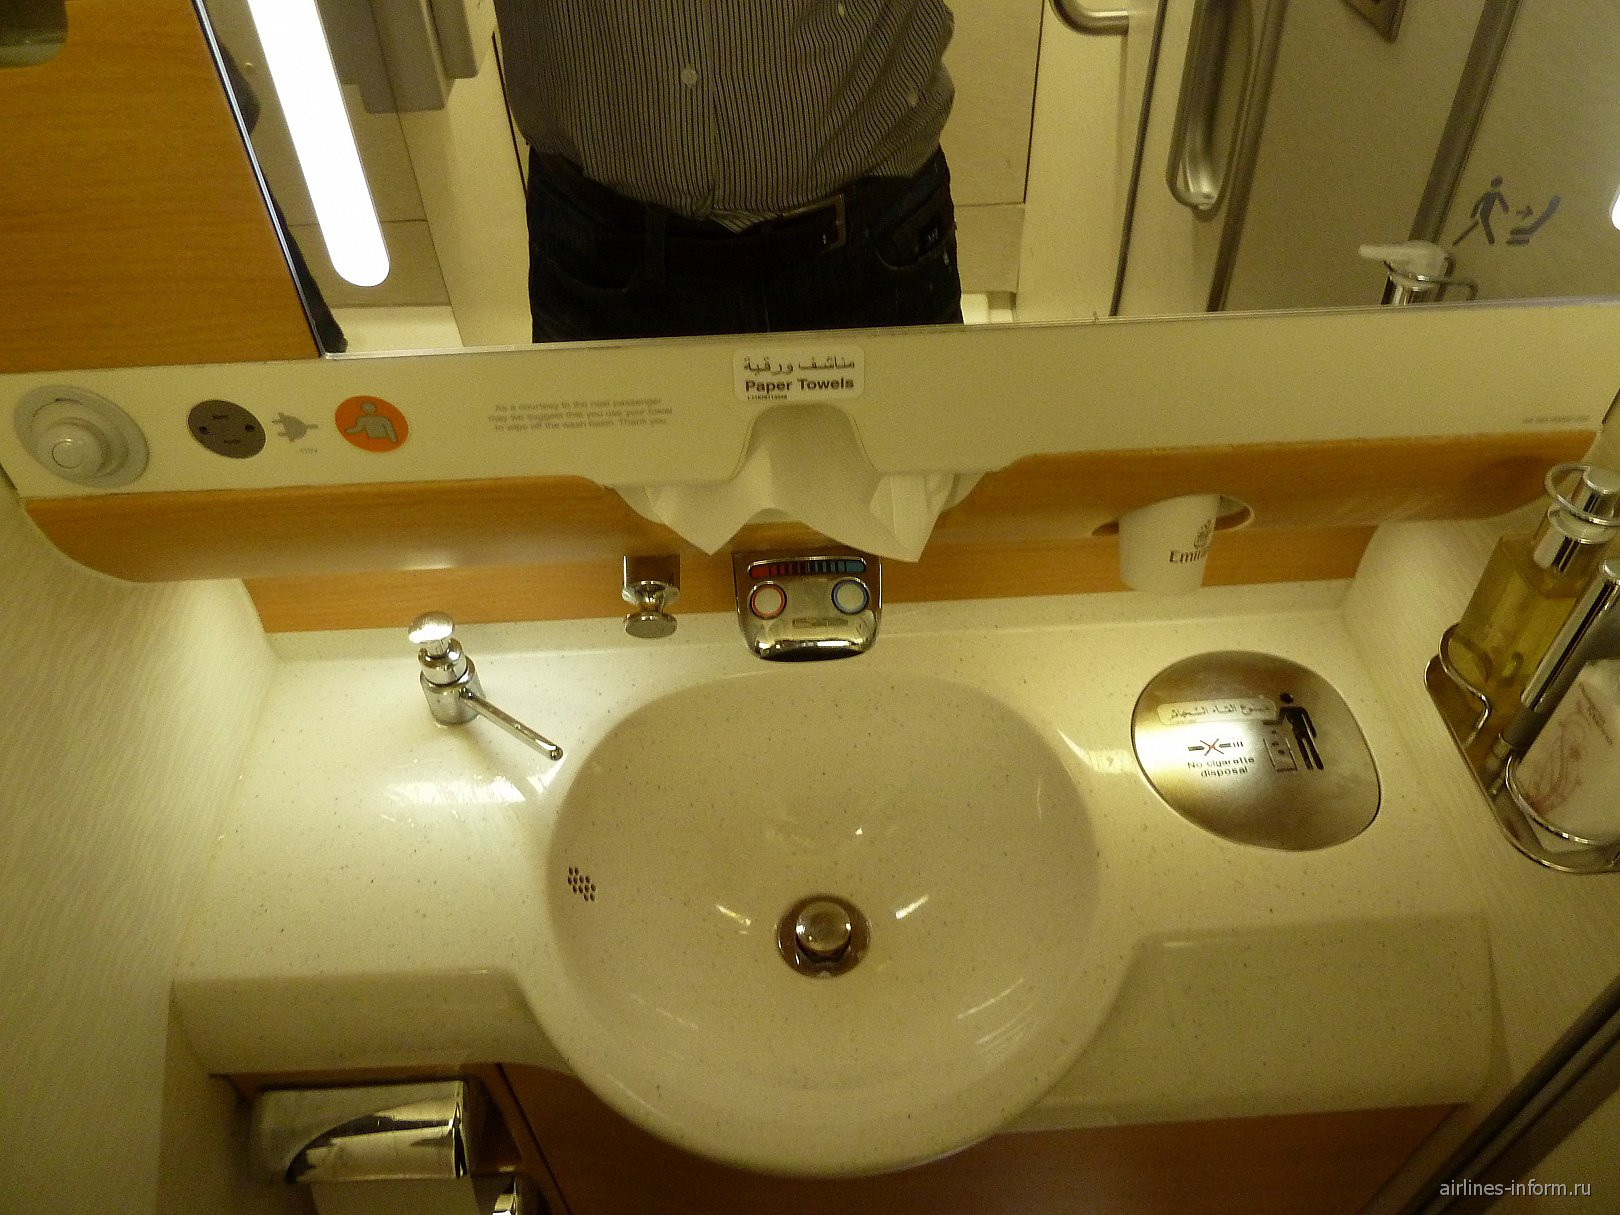 Туалет самолета Airbus A380 авиакомпании Emirates